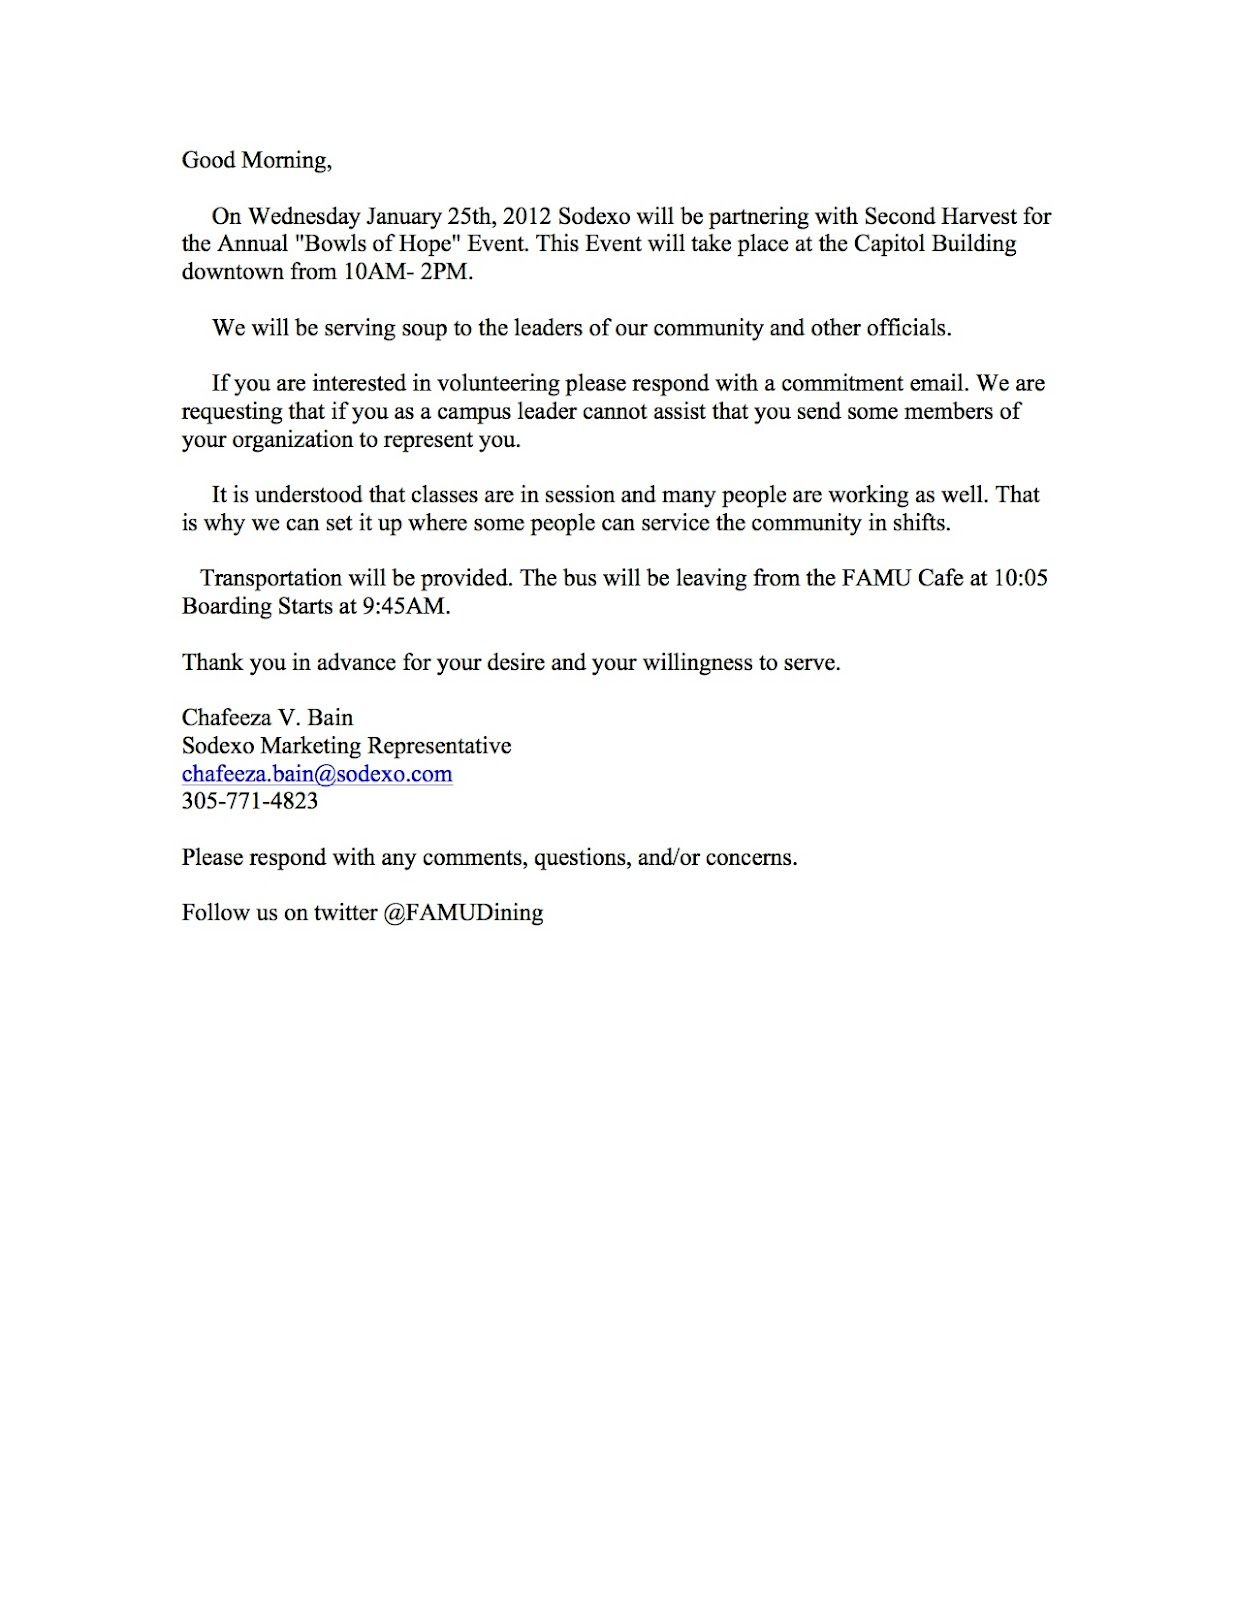 Request For Volunteers Letter Sample